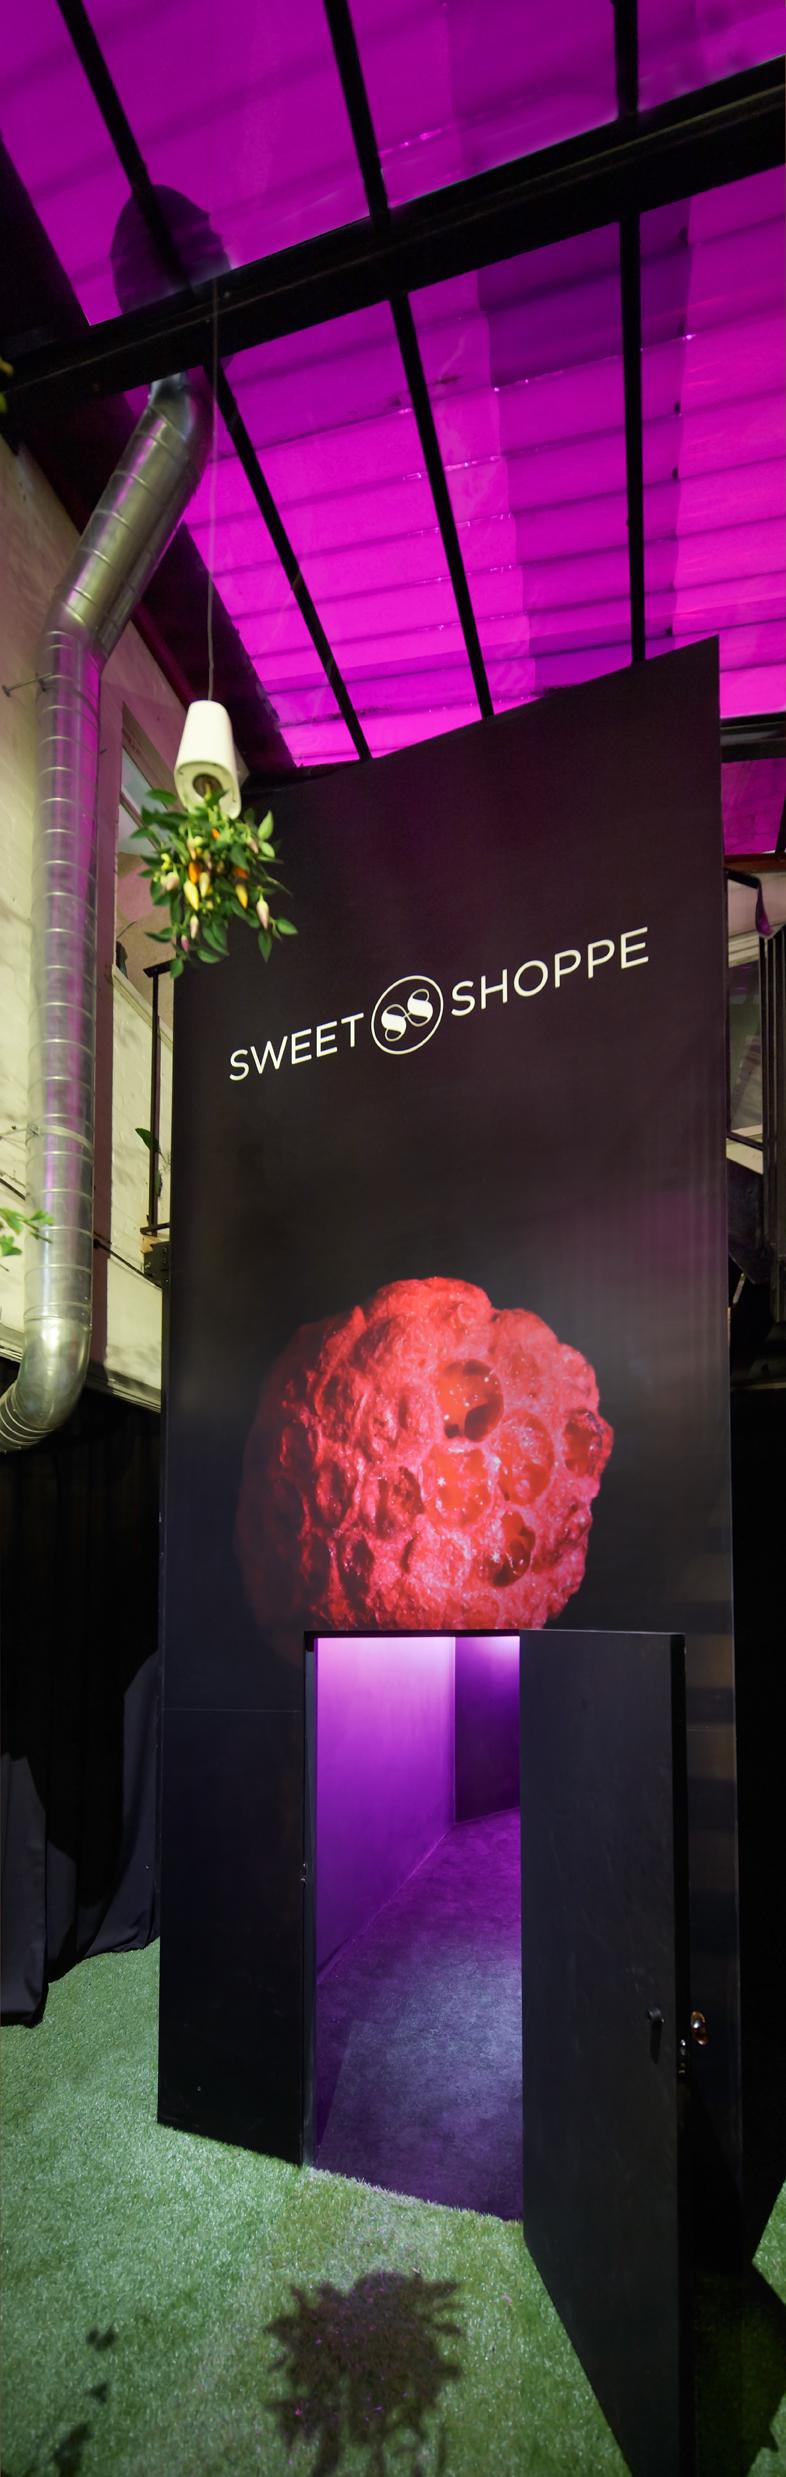 Sweet Shoppe 010LR.jpg